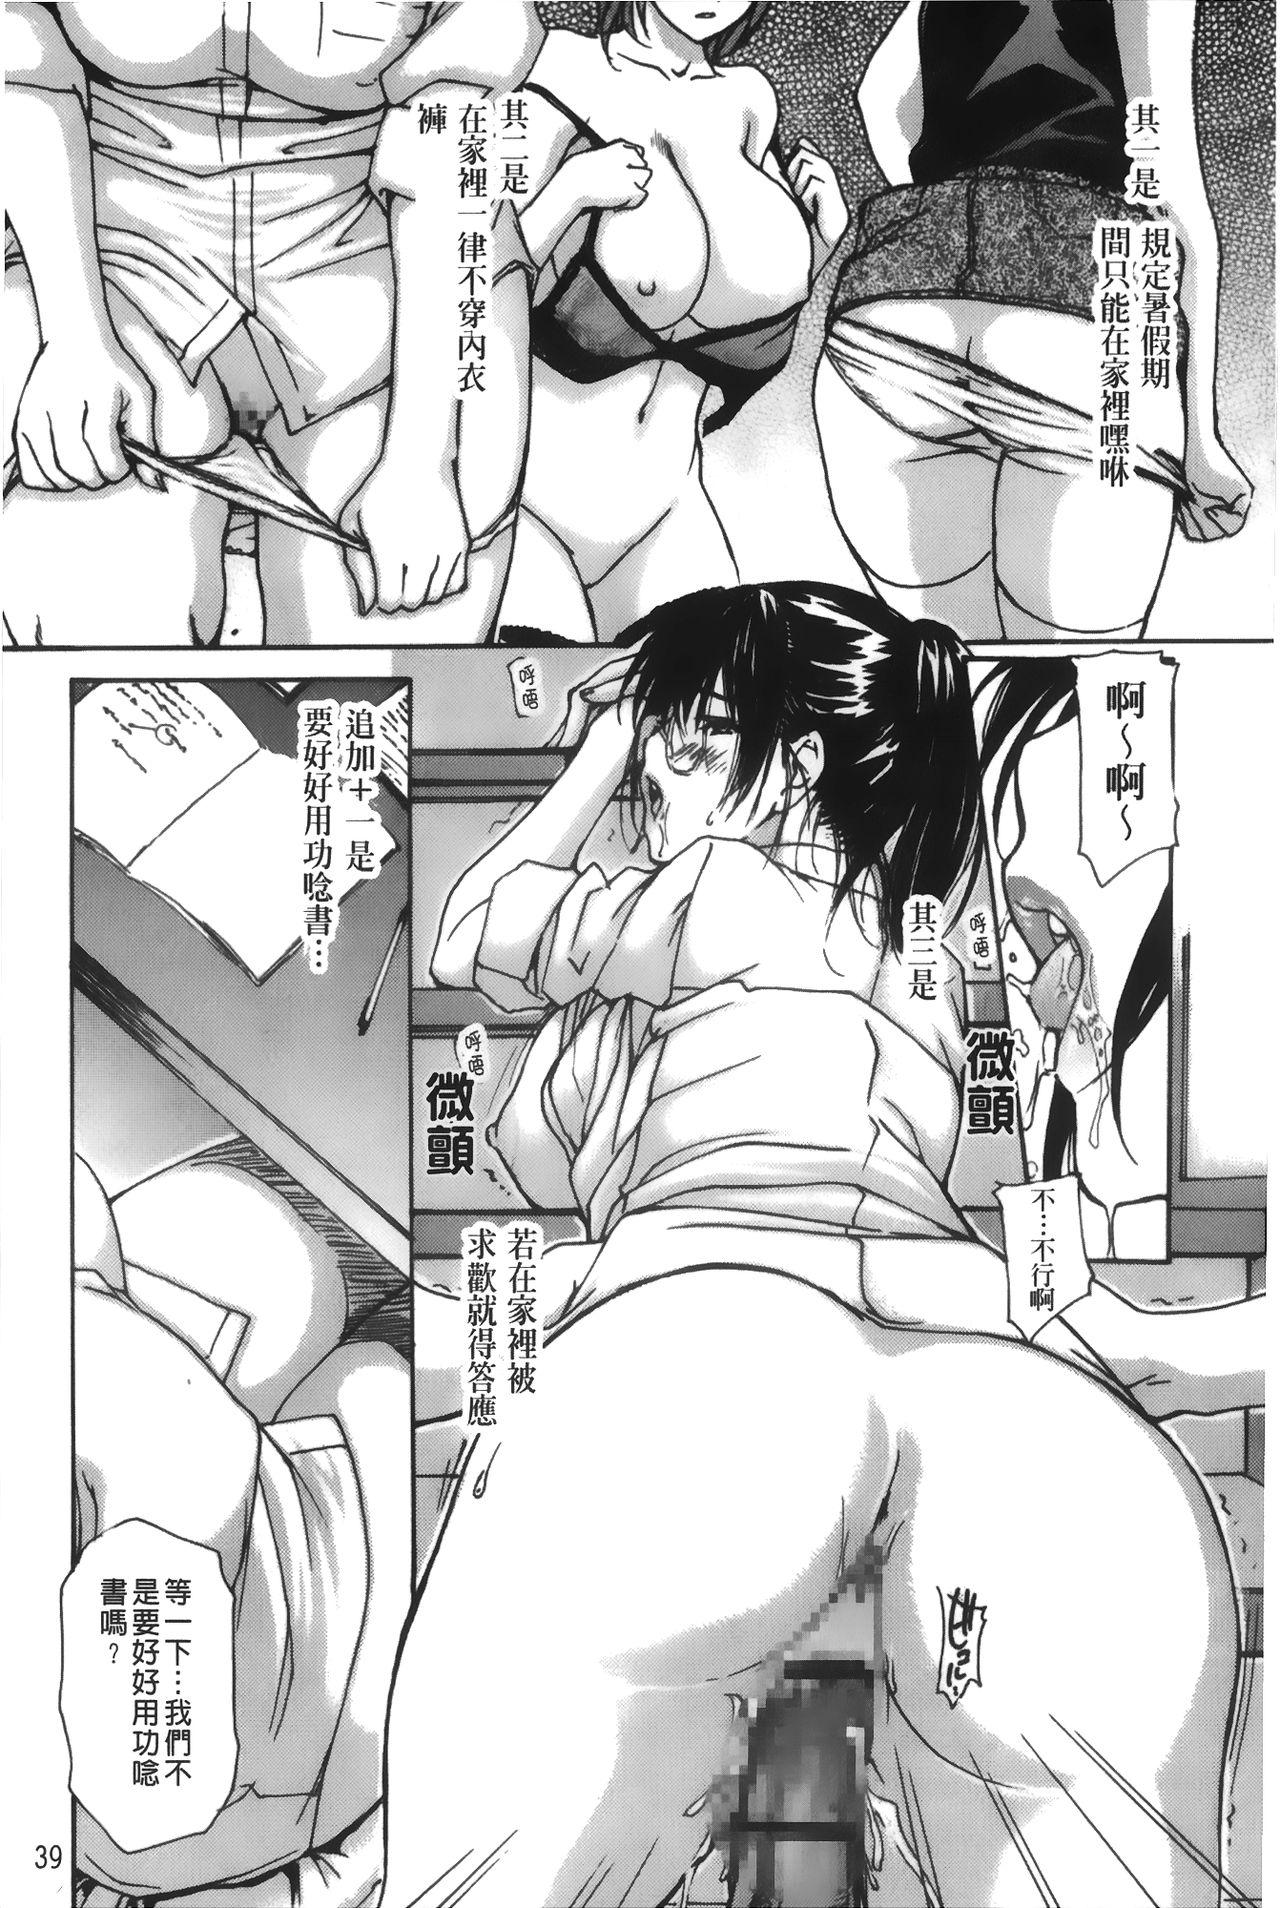 Tonari no Minano Sensei 4 | 隔壁的美奈乃老師 4 40